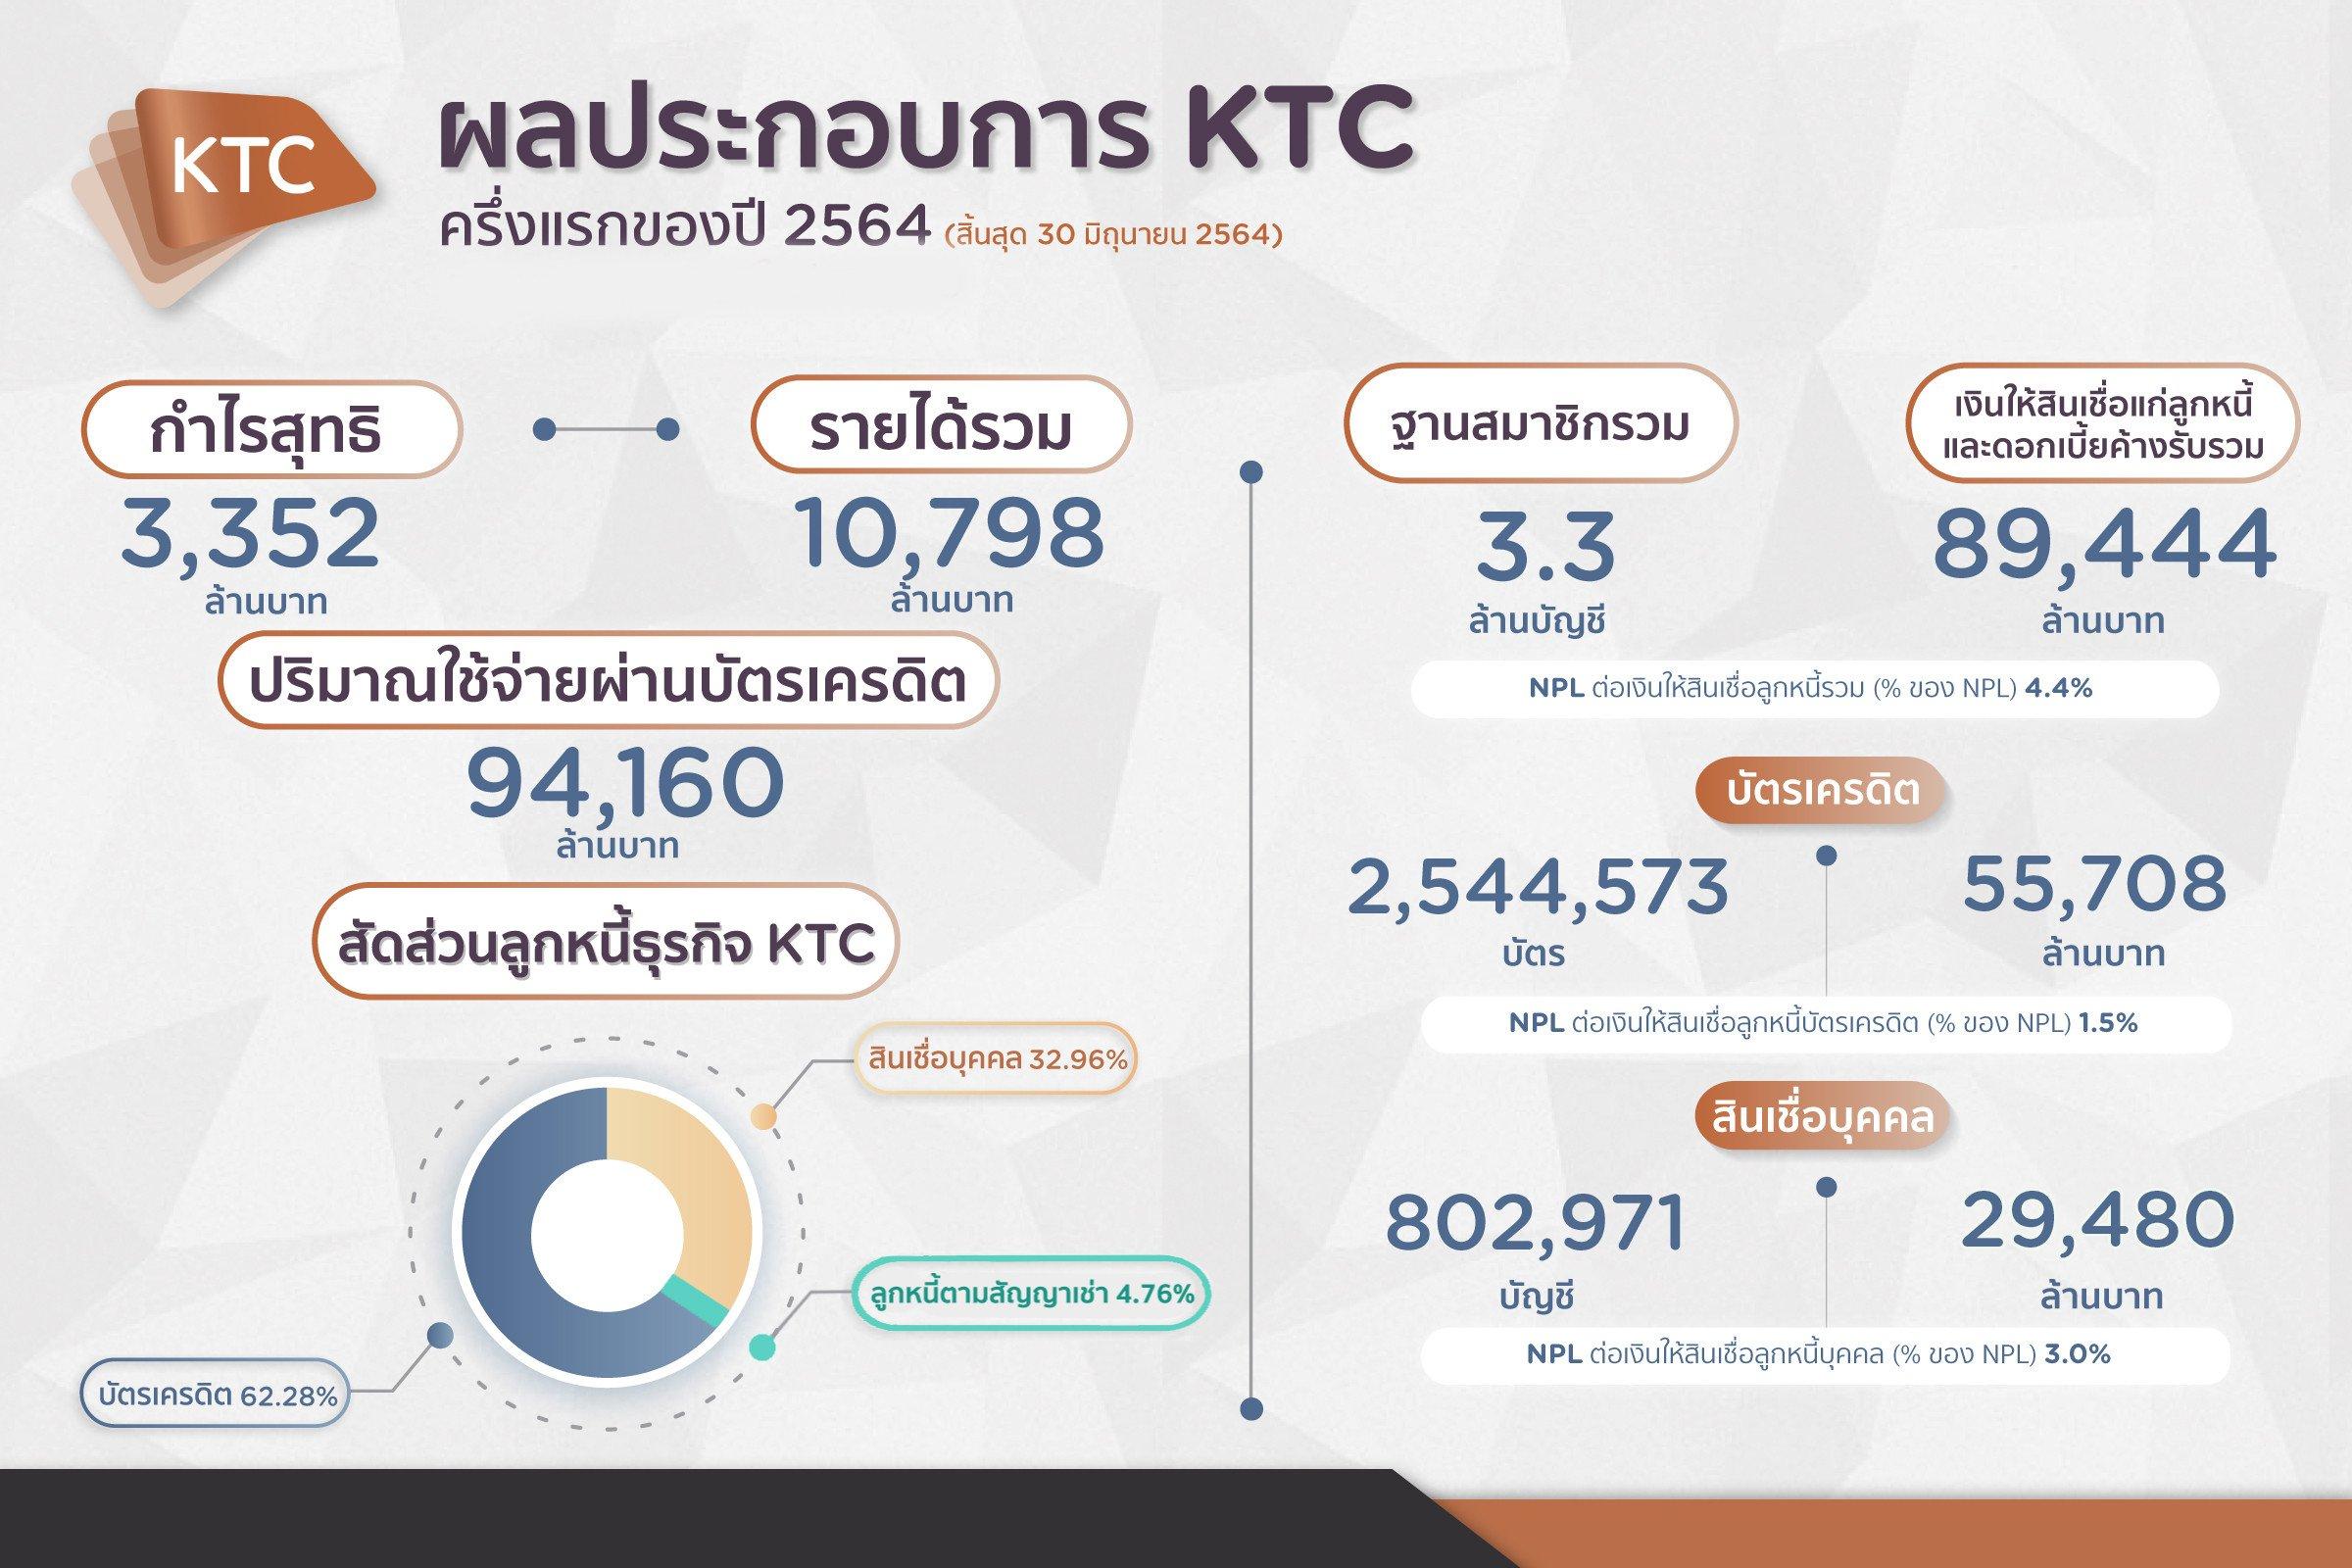 ktc performance 1h2021 (3)